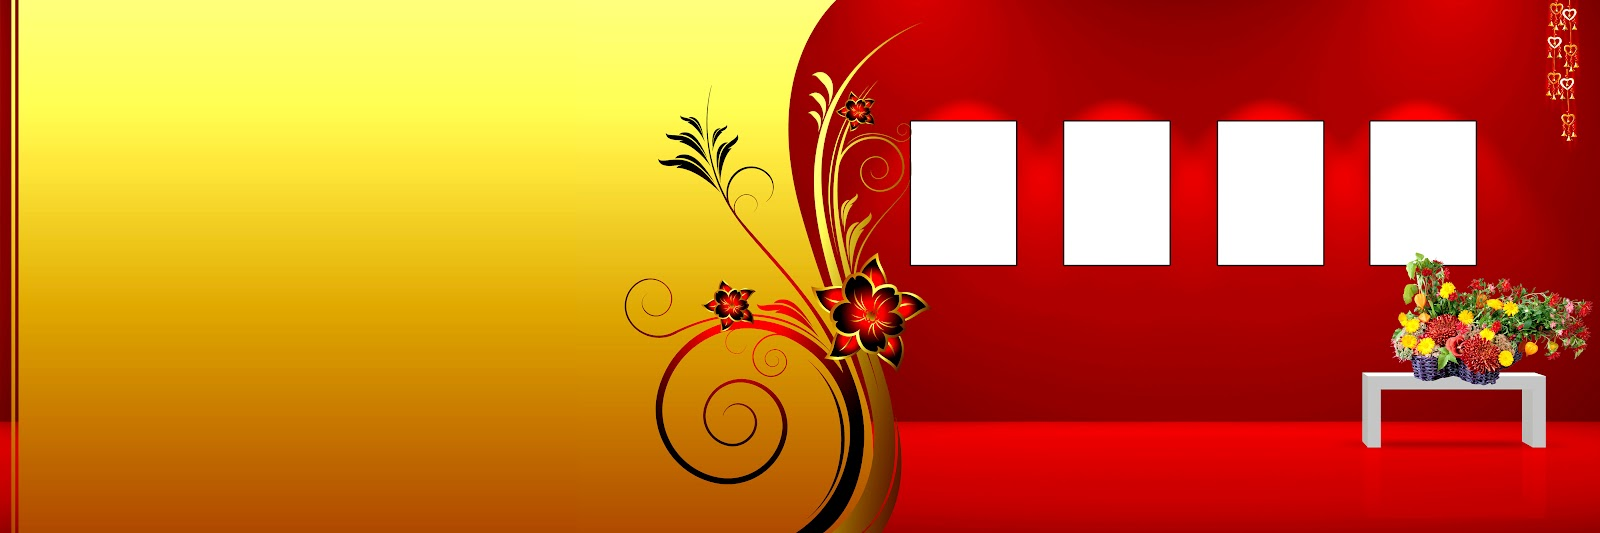 Digital banner design for psd files - 12x36 Album Photoshop Templates Creations Naveengfx